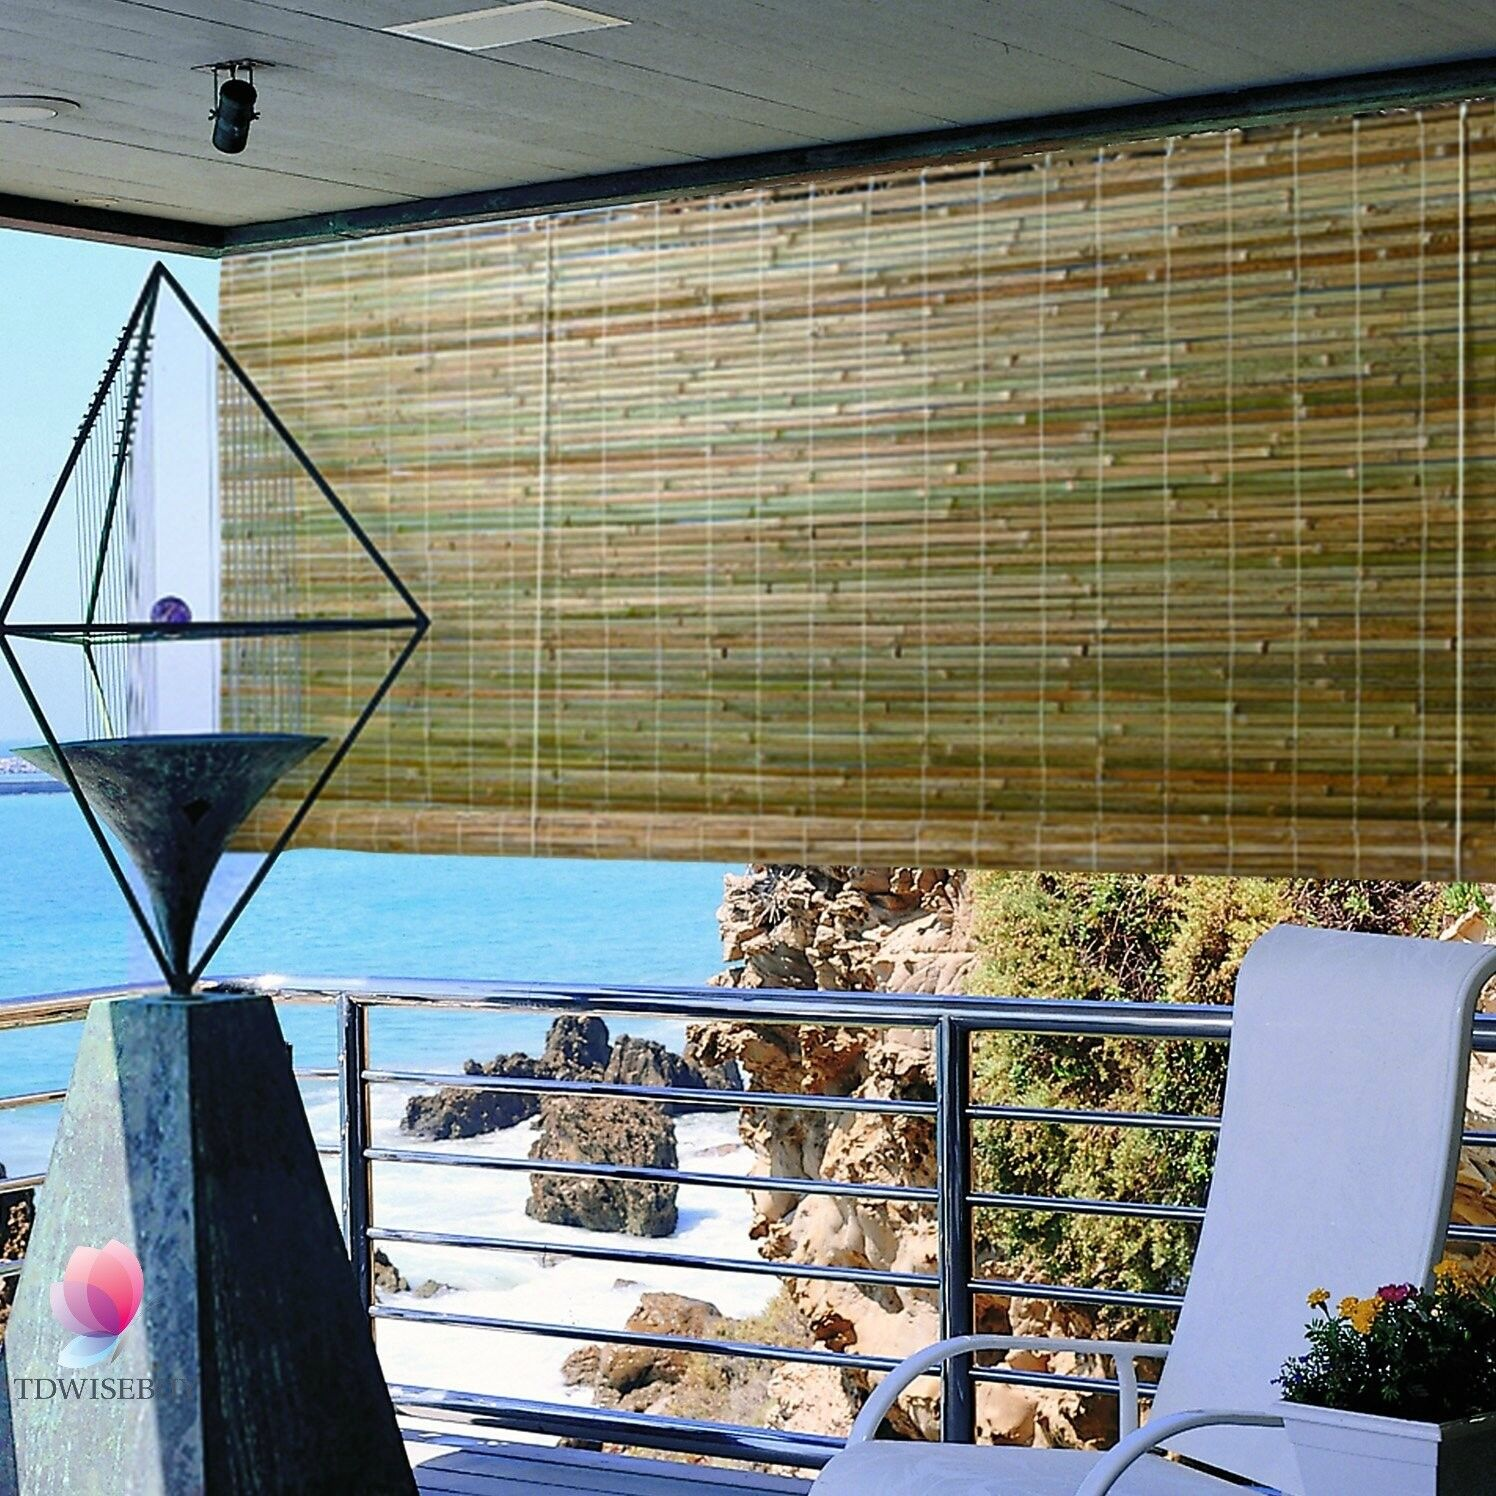 "Bamboo Shade 96 x 72"" Roll Up Laguna Window Natural Rustic Roman Outdoor Blind"